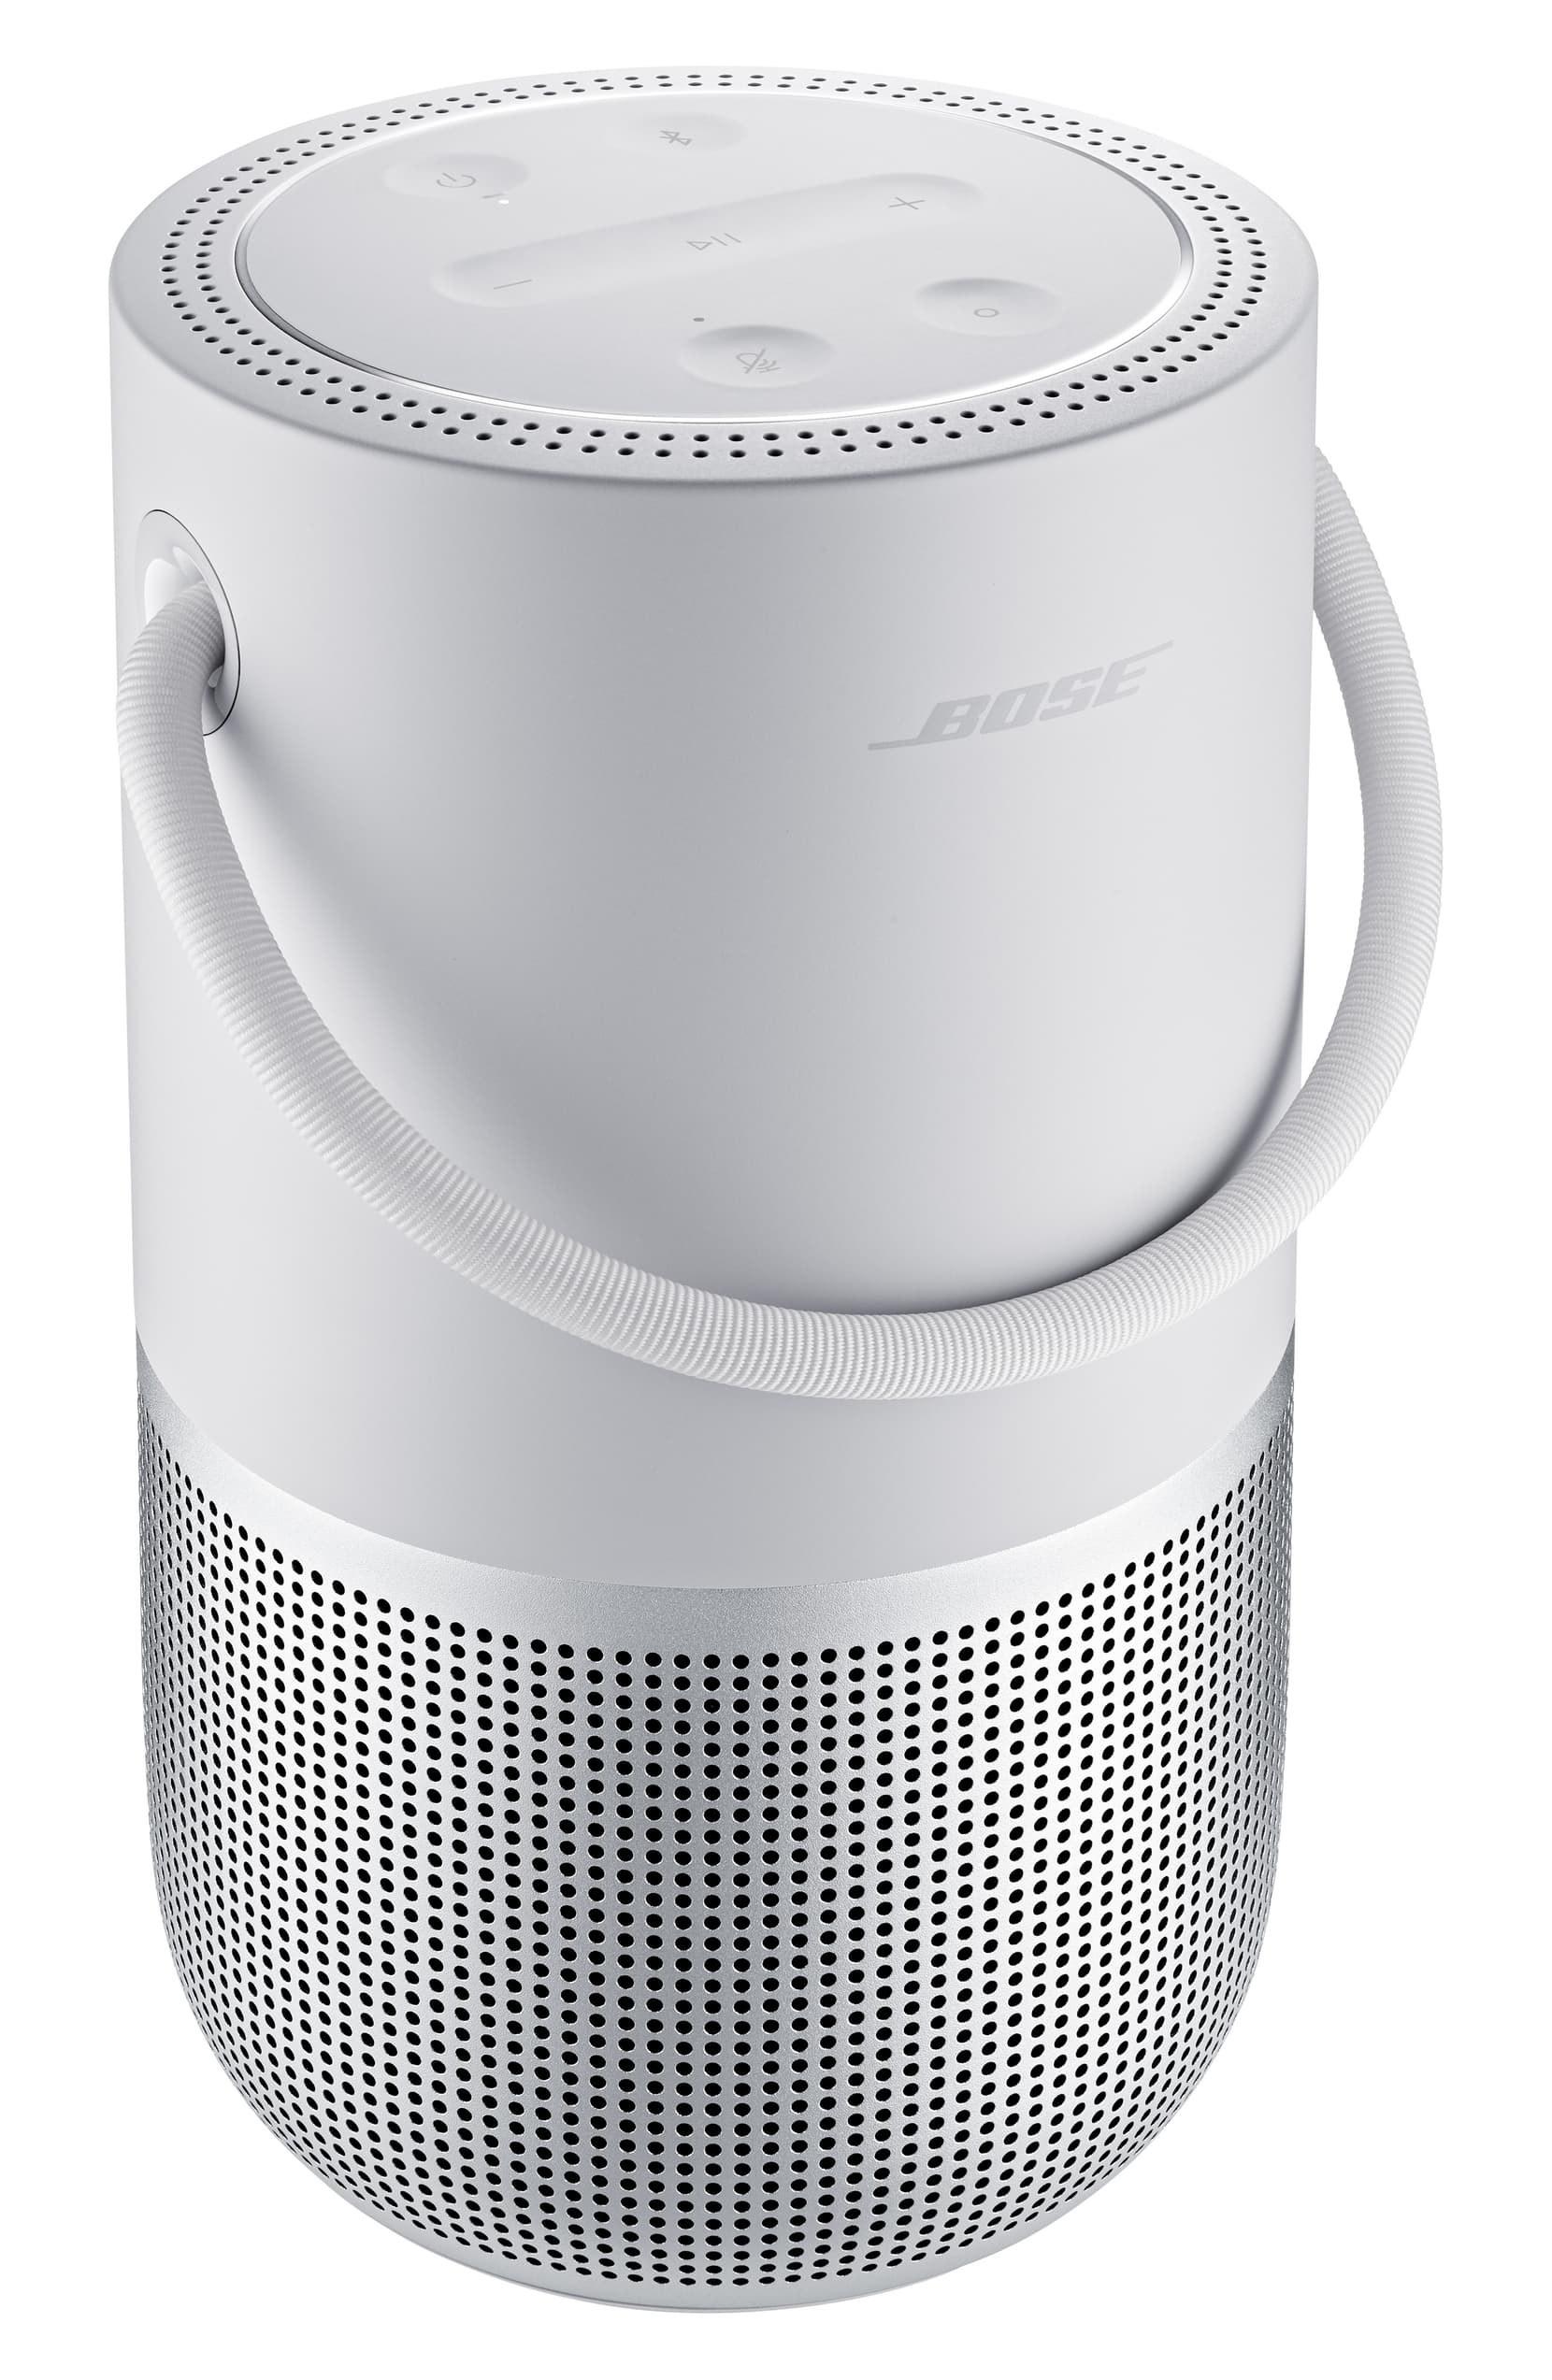 White portable Bose bluetooth speaker upright